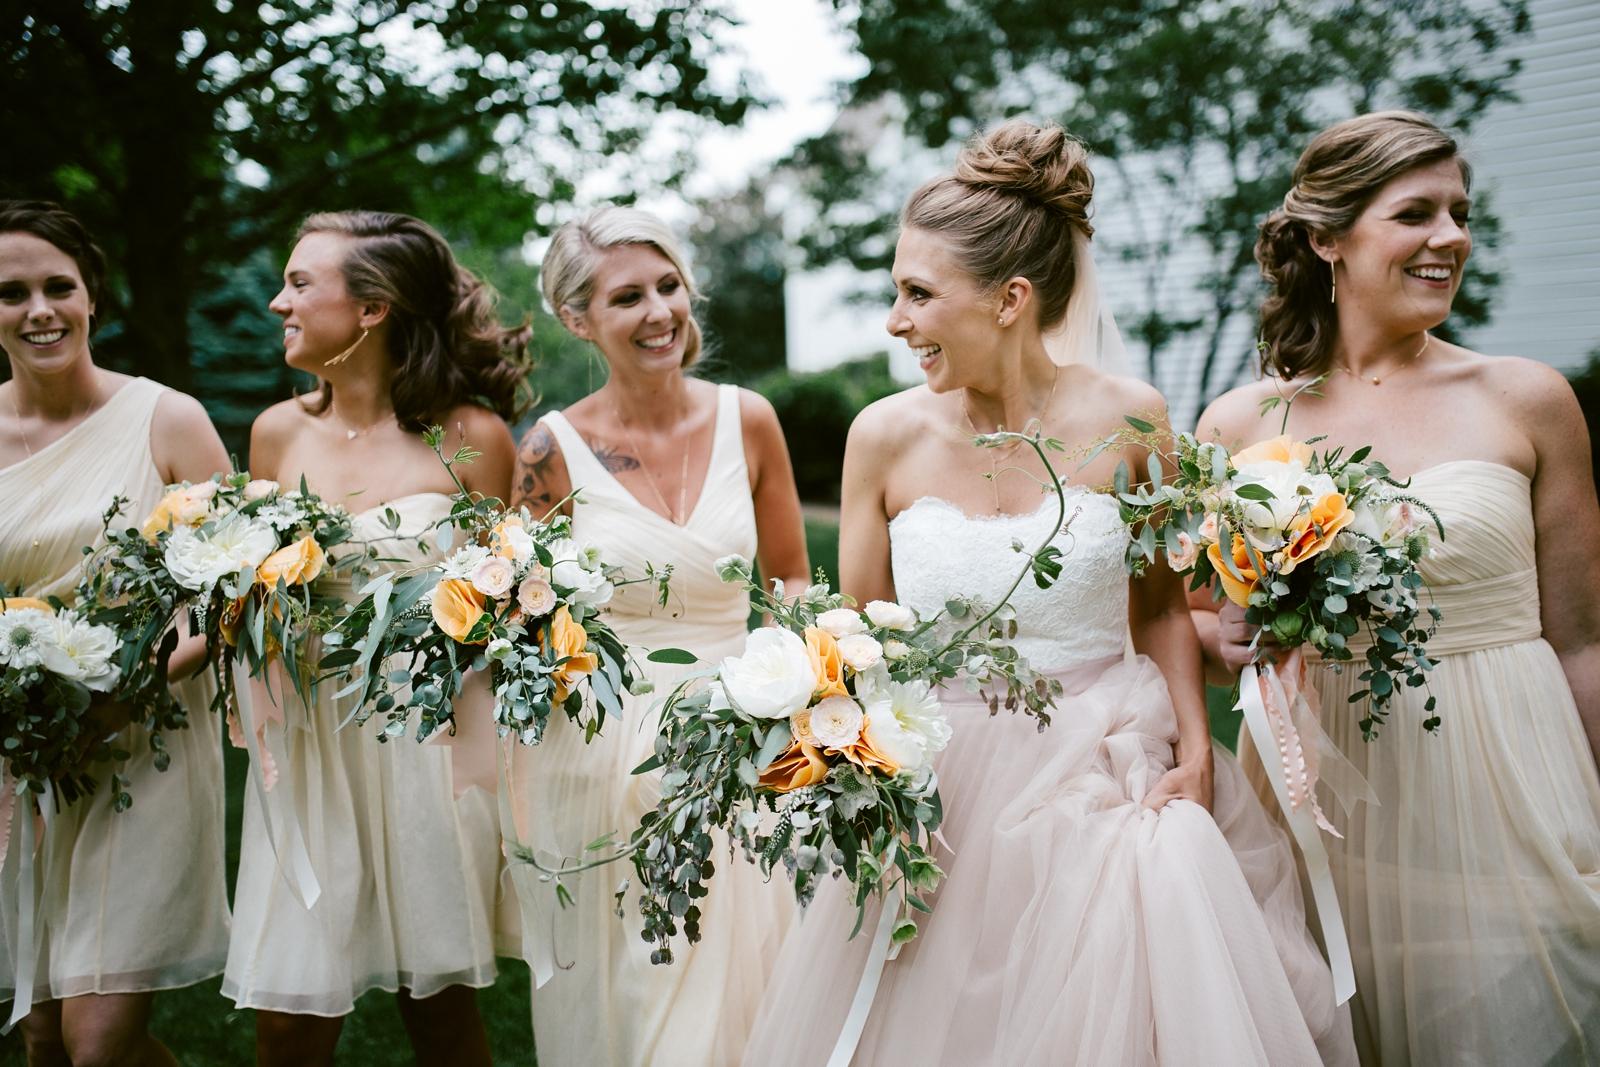 wedding-whitneyjohn-055.jpg